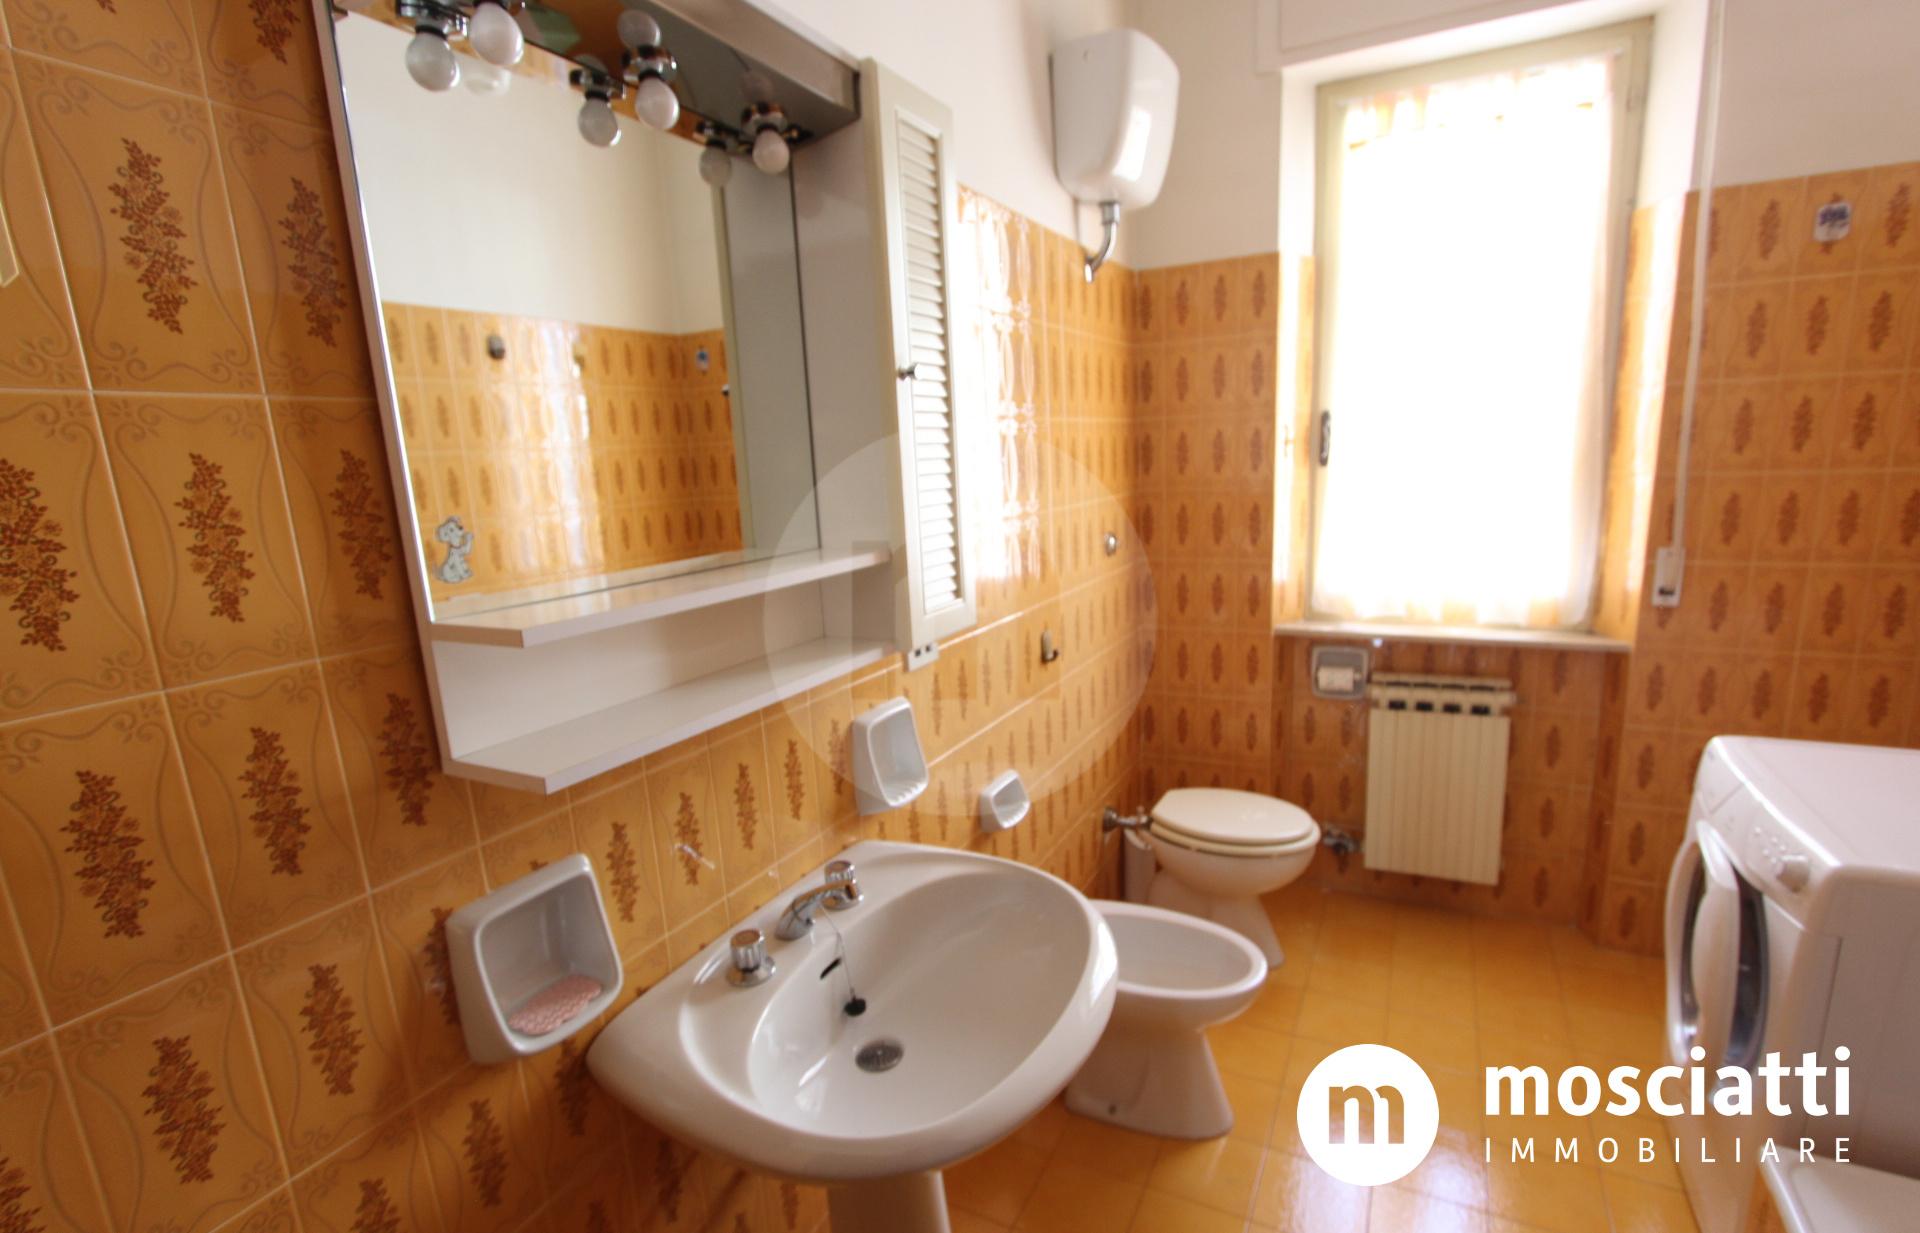 Castelraimondo, Via Enrico Mattei, vendesi appartamento al piano primo con garage - 1